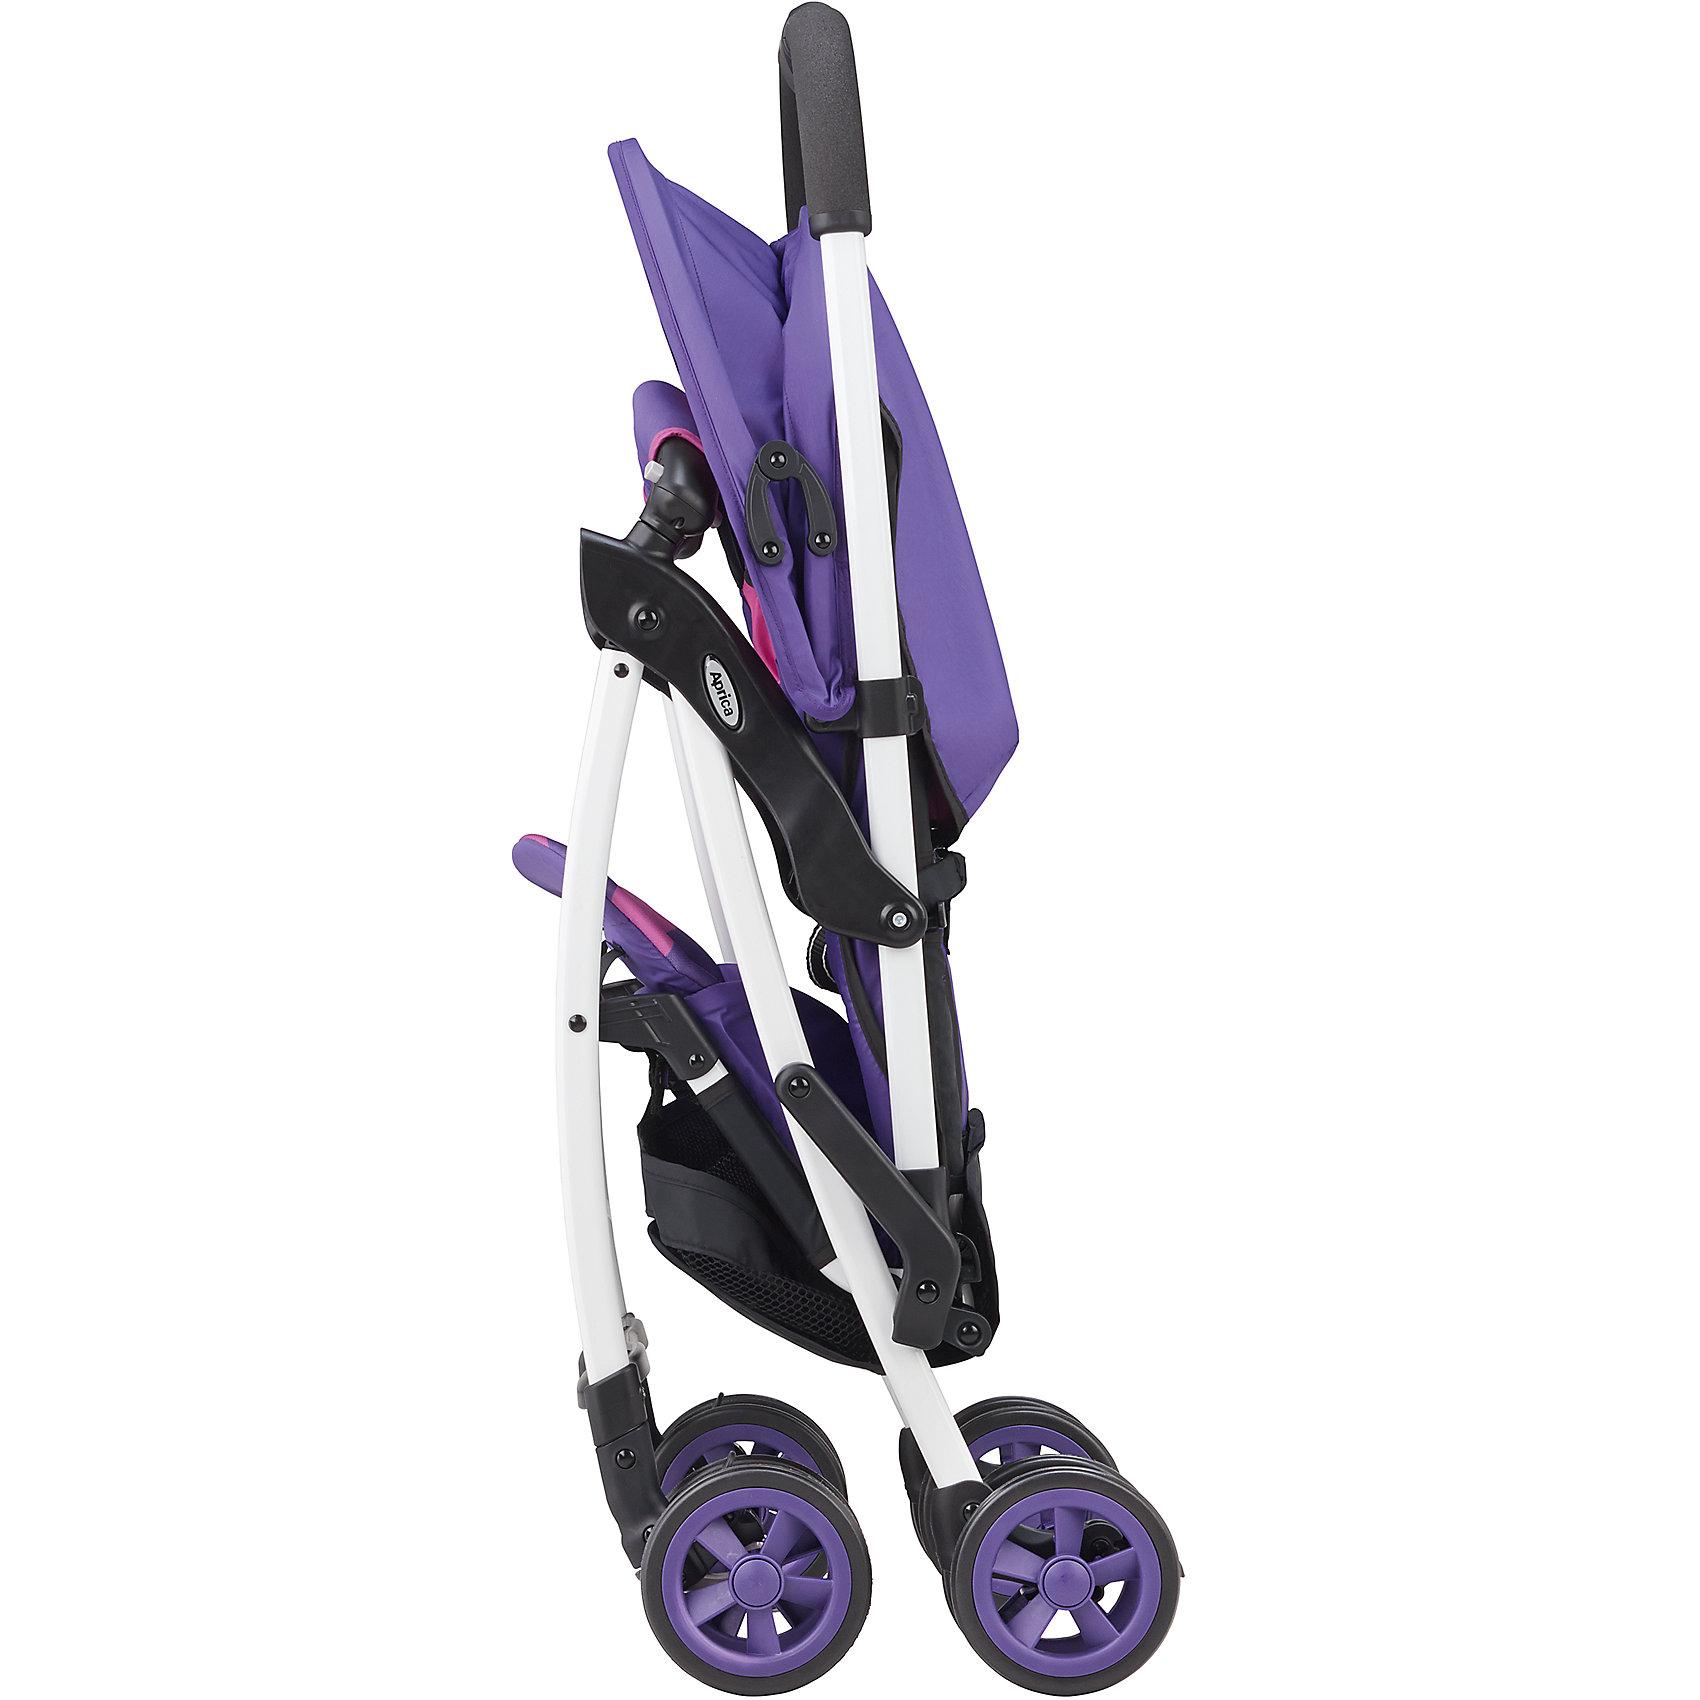 Прогулочная коляска Aprica Magical Air, фиолетовый